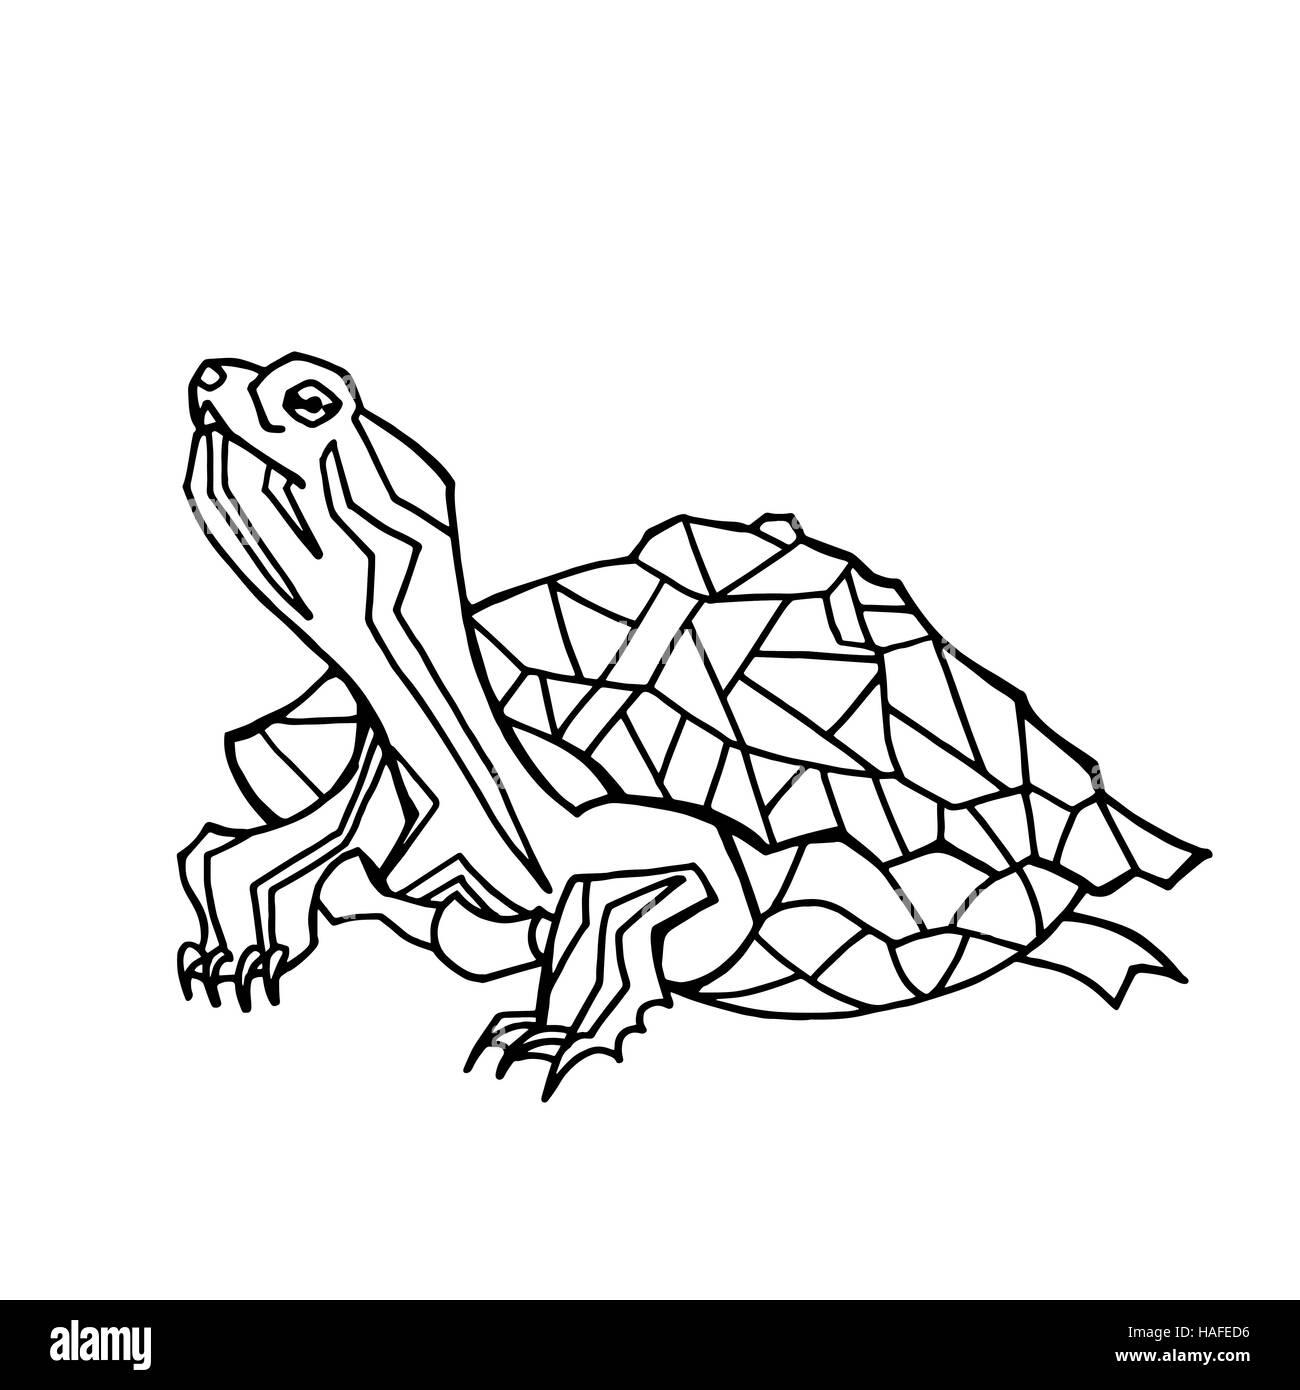 Vector Ilustración Dibujada A Mano De Tortuga Silueta Negra De